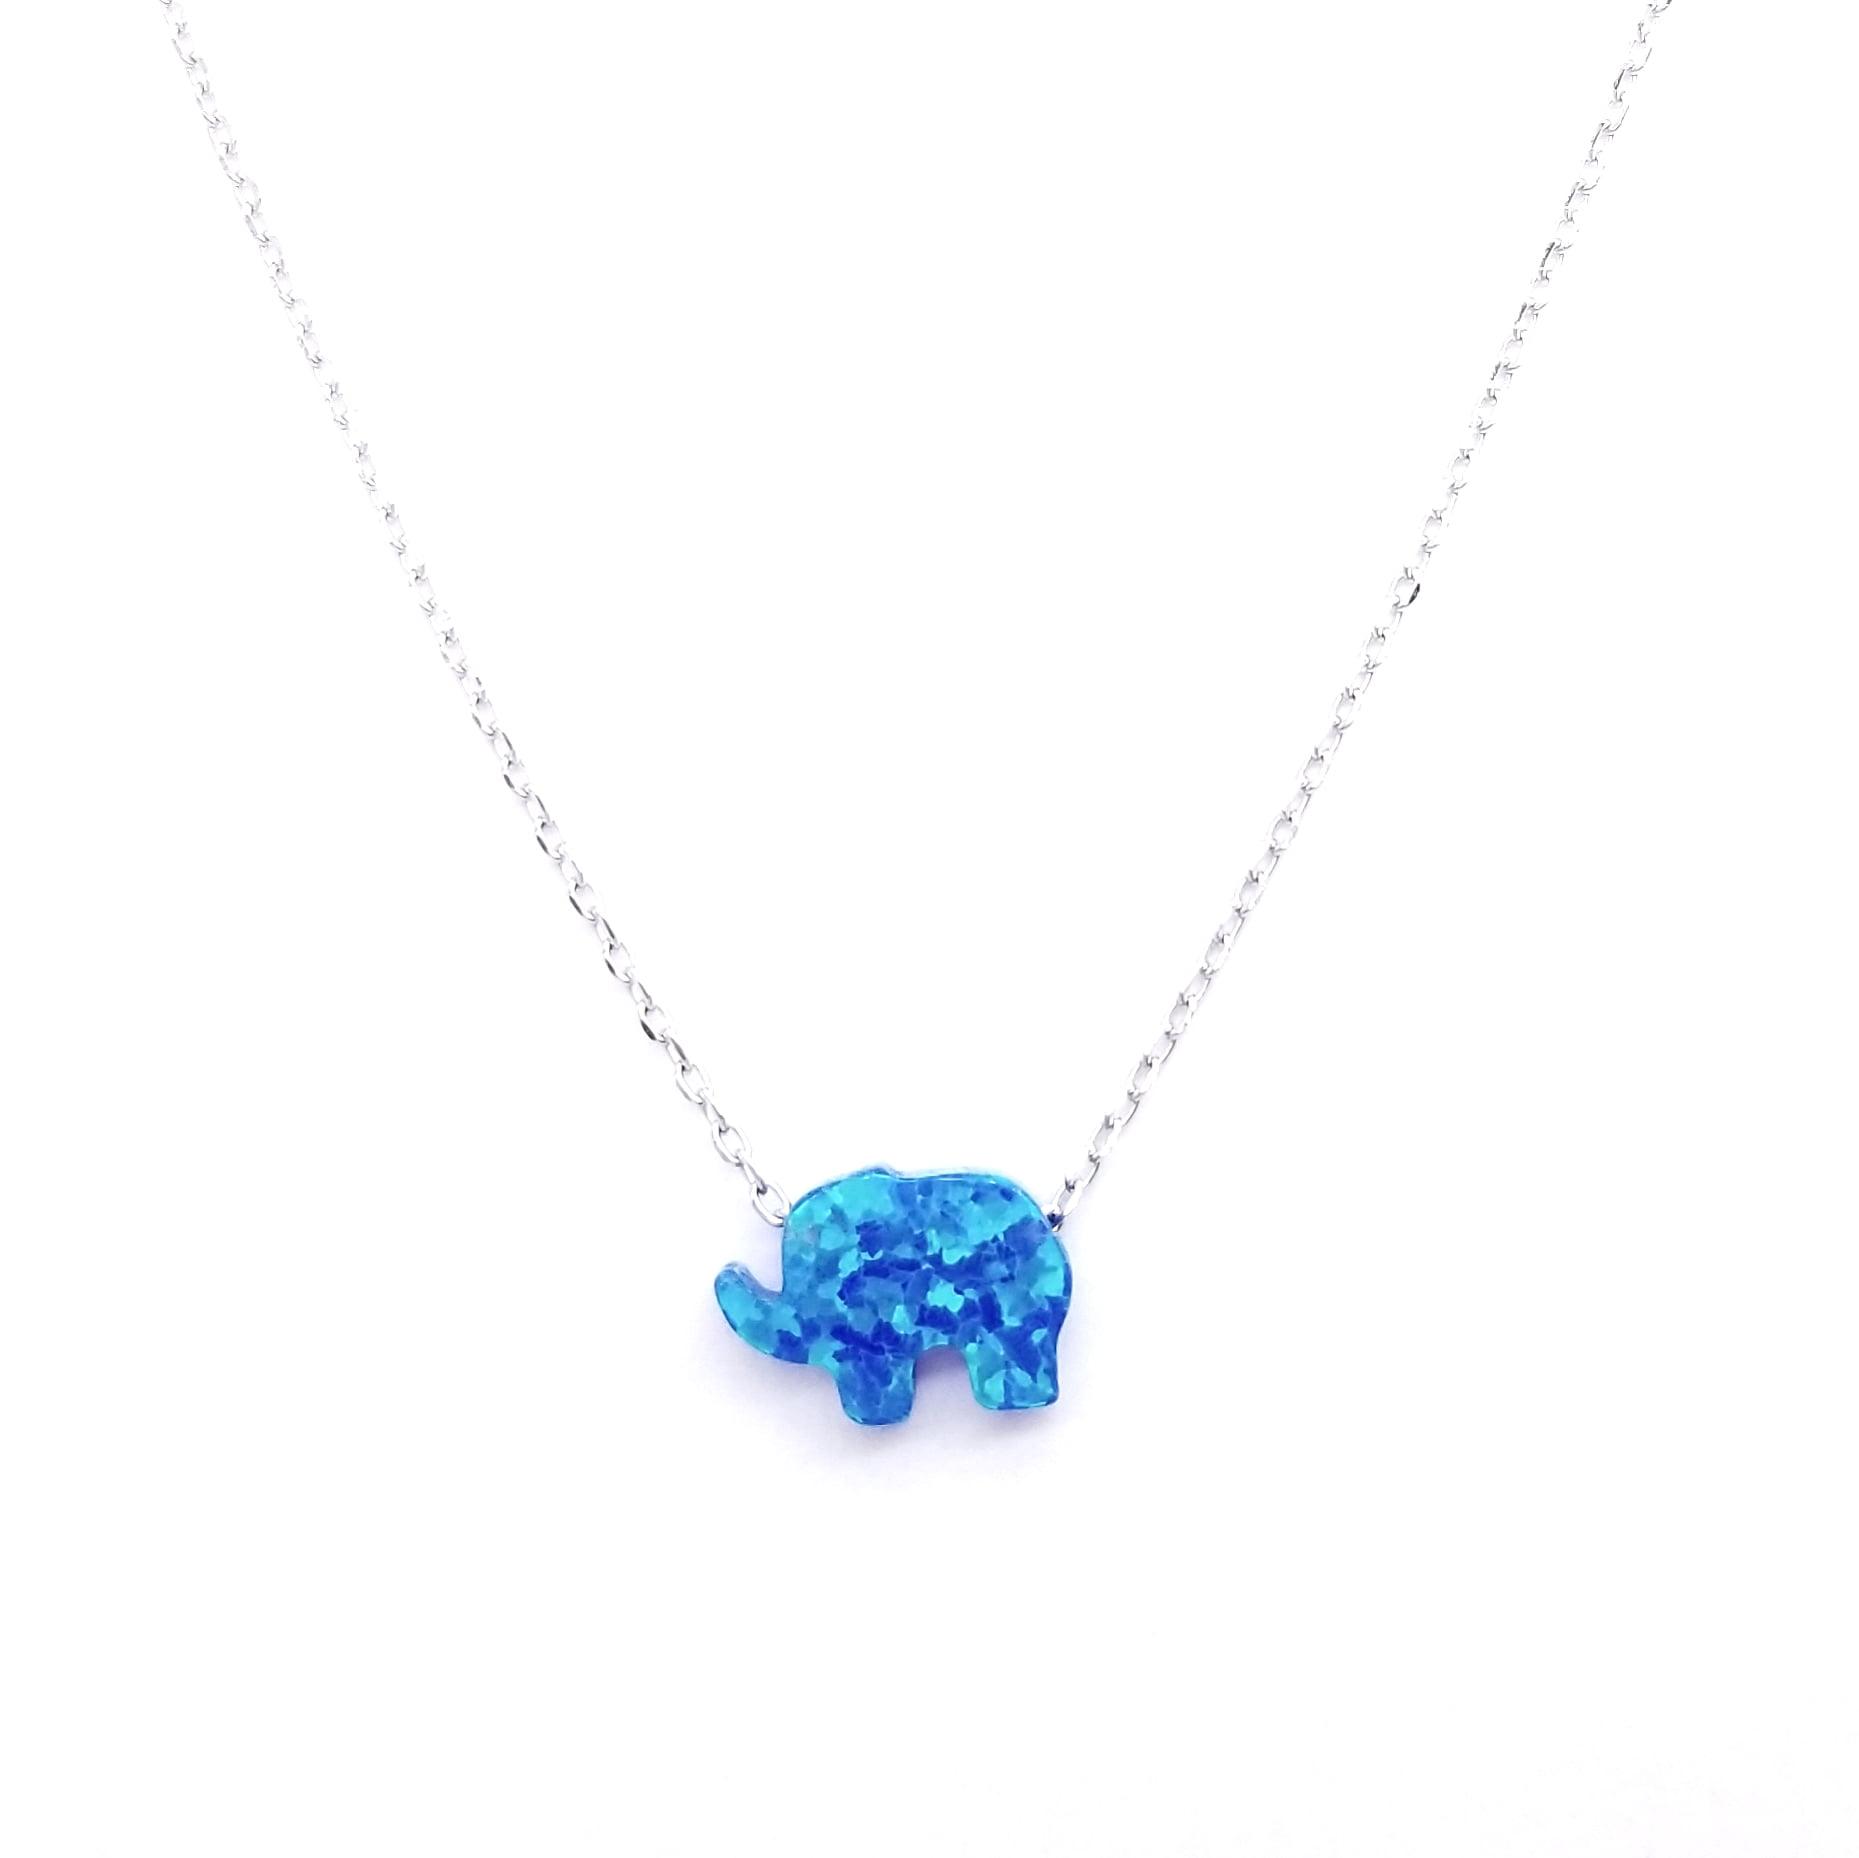 Opal Elephant Necklace